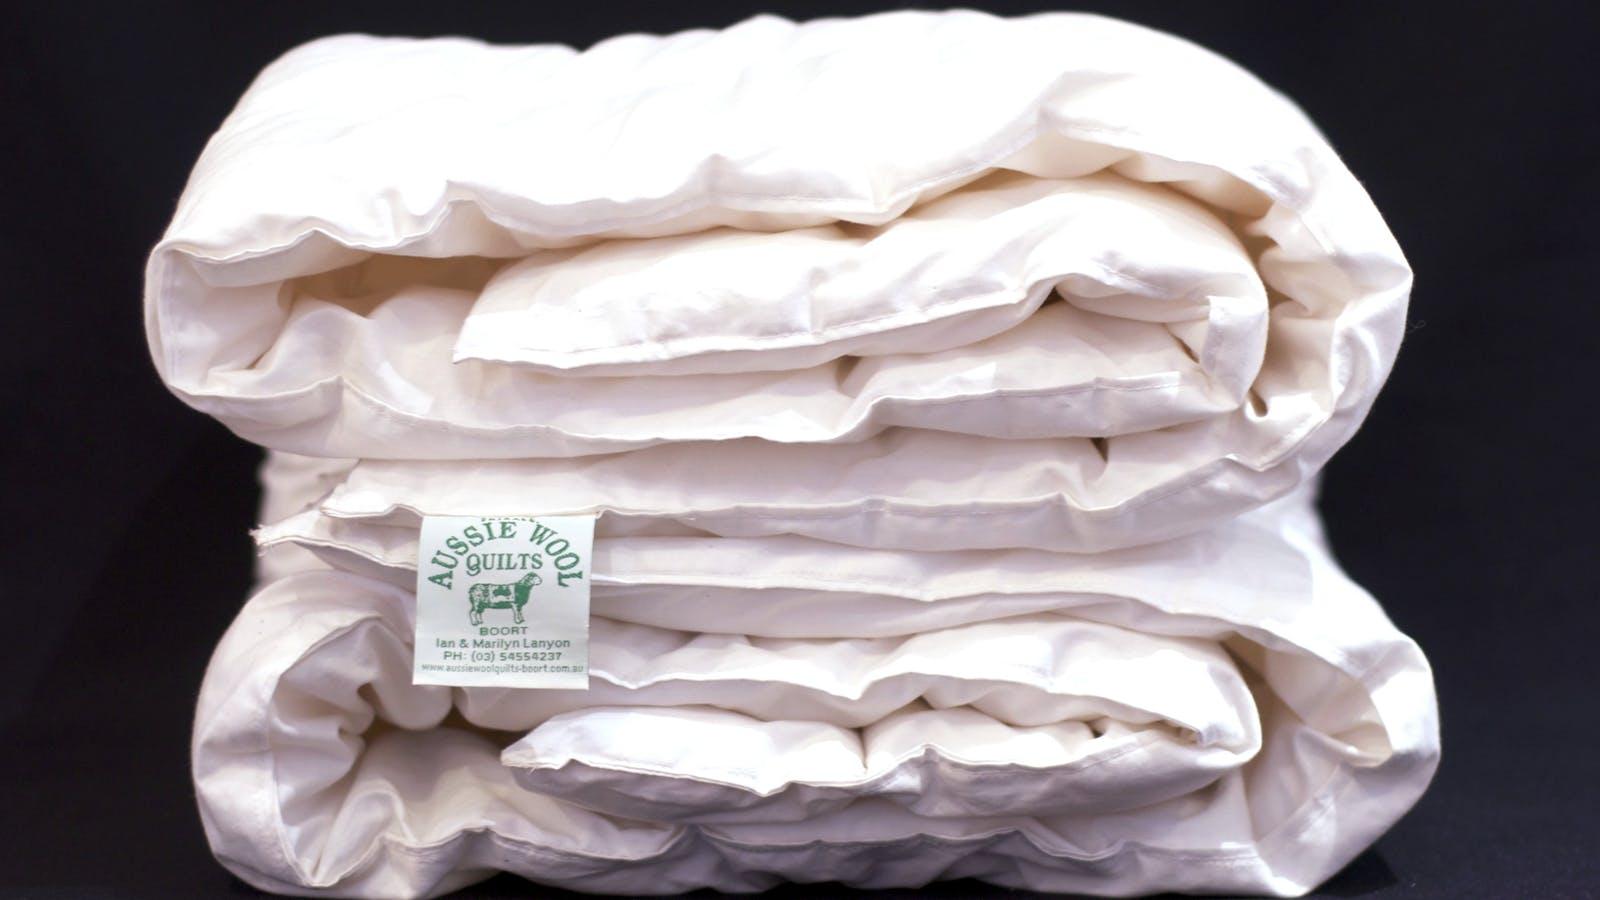 Folded quilt